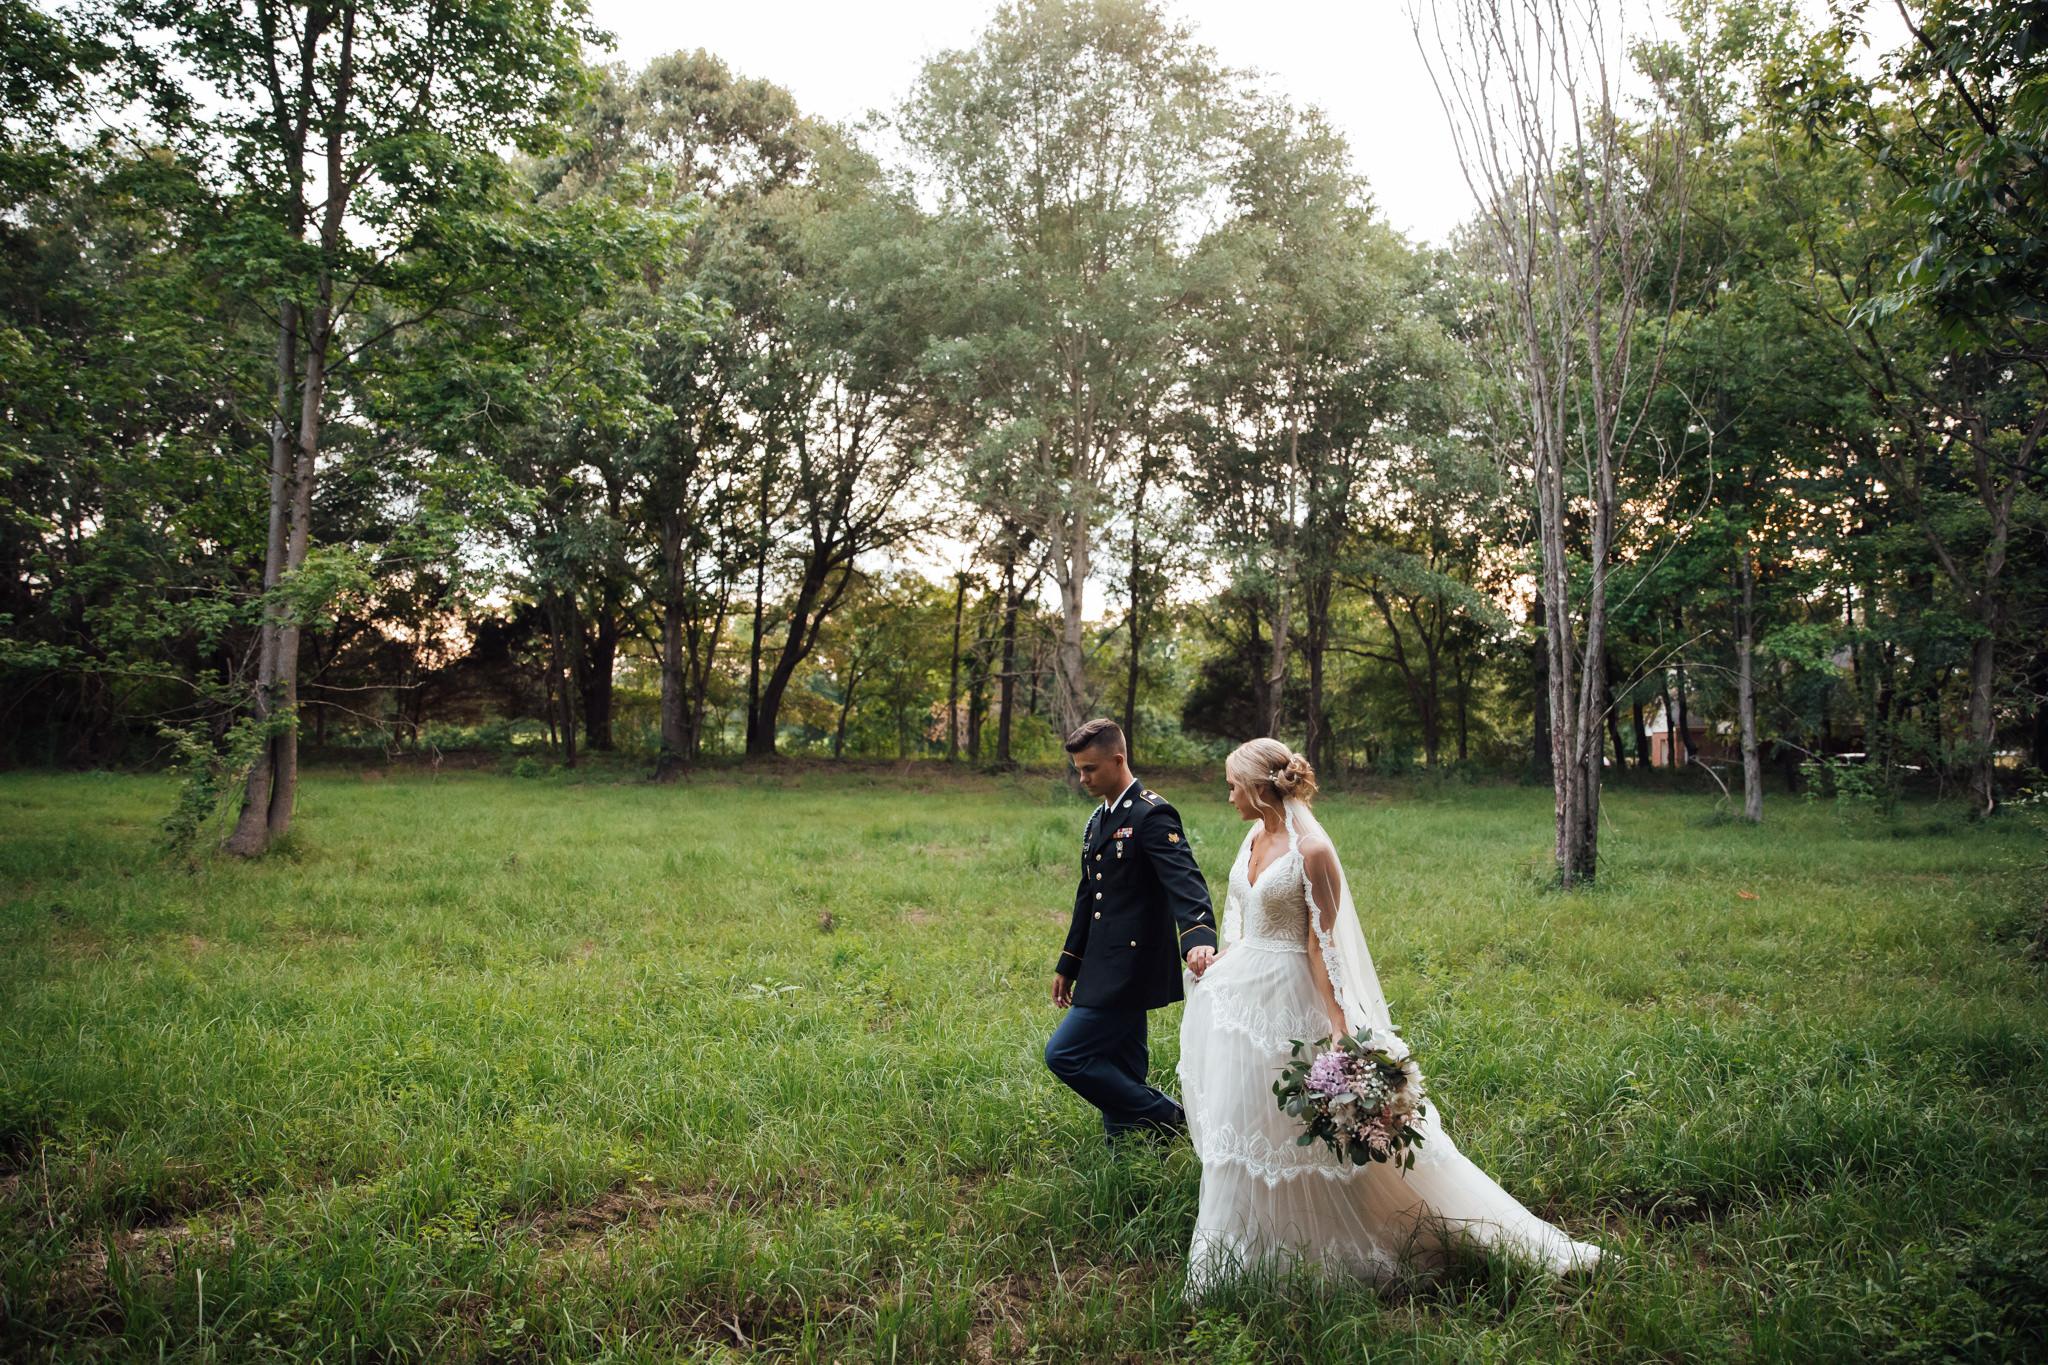 backyard-wedding-thewarmtharoundyou-lexy-branson-74.jpg